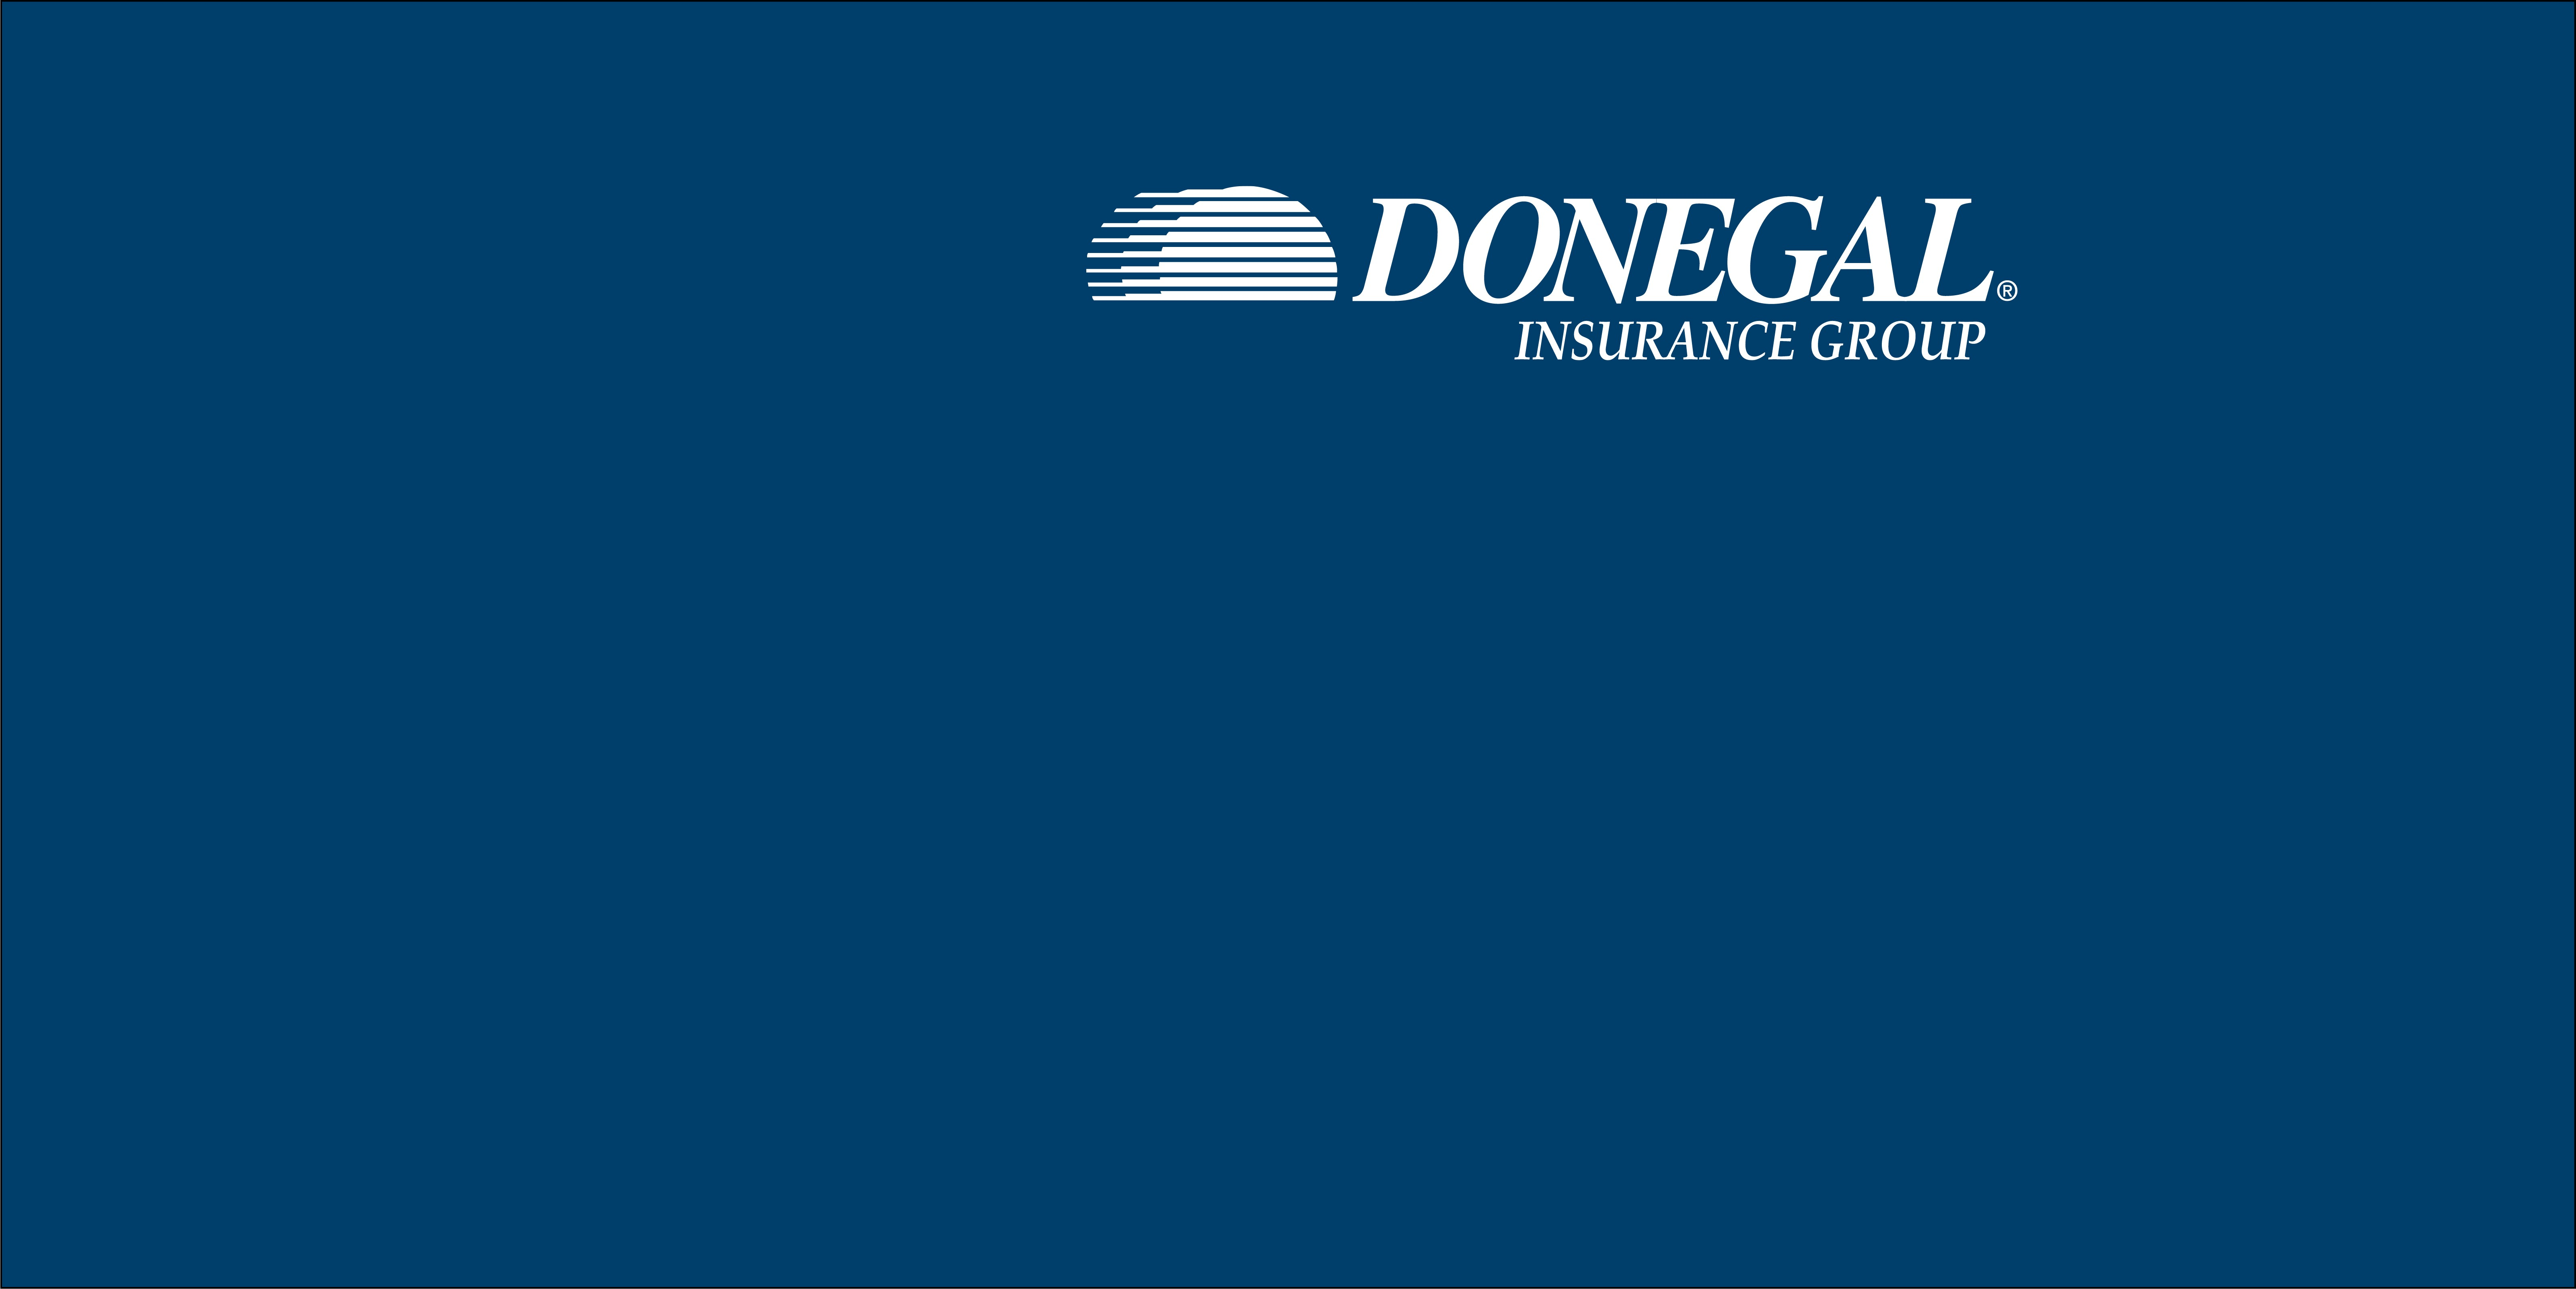 Donegal Insurance Group Linkedin